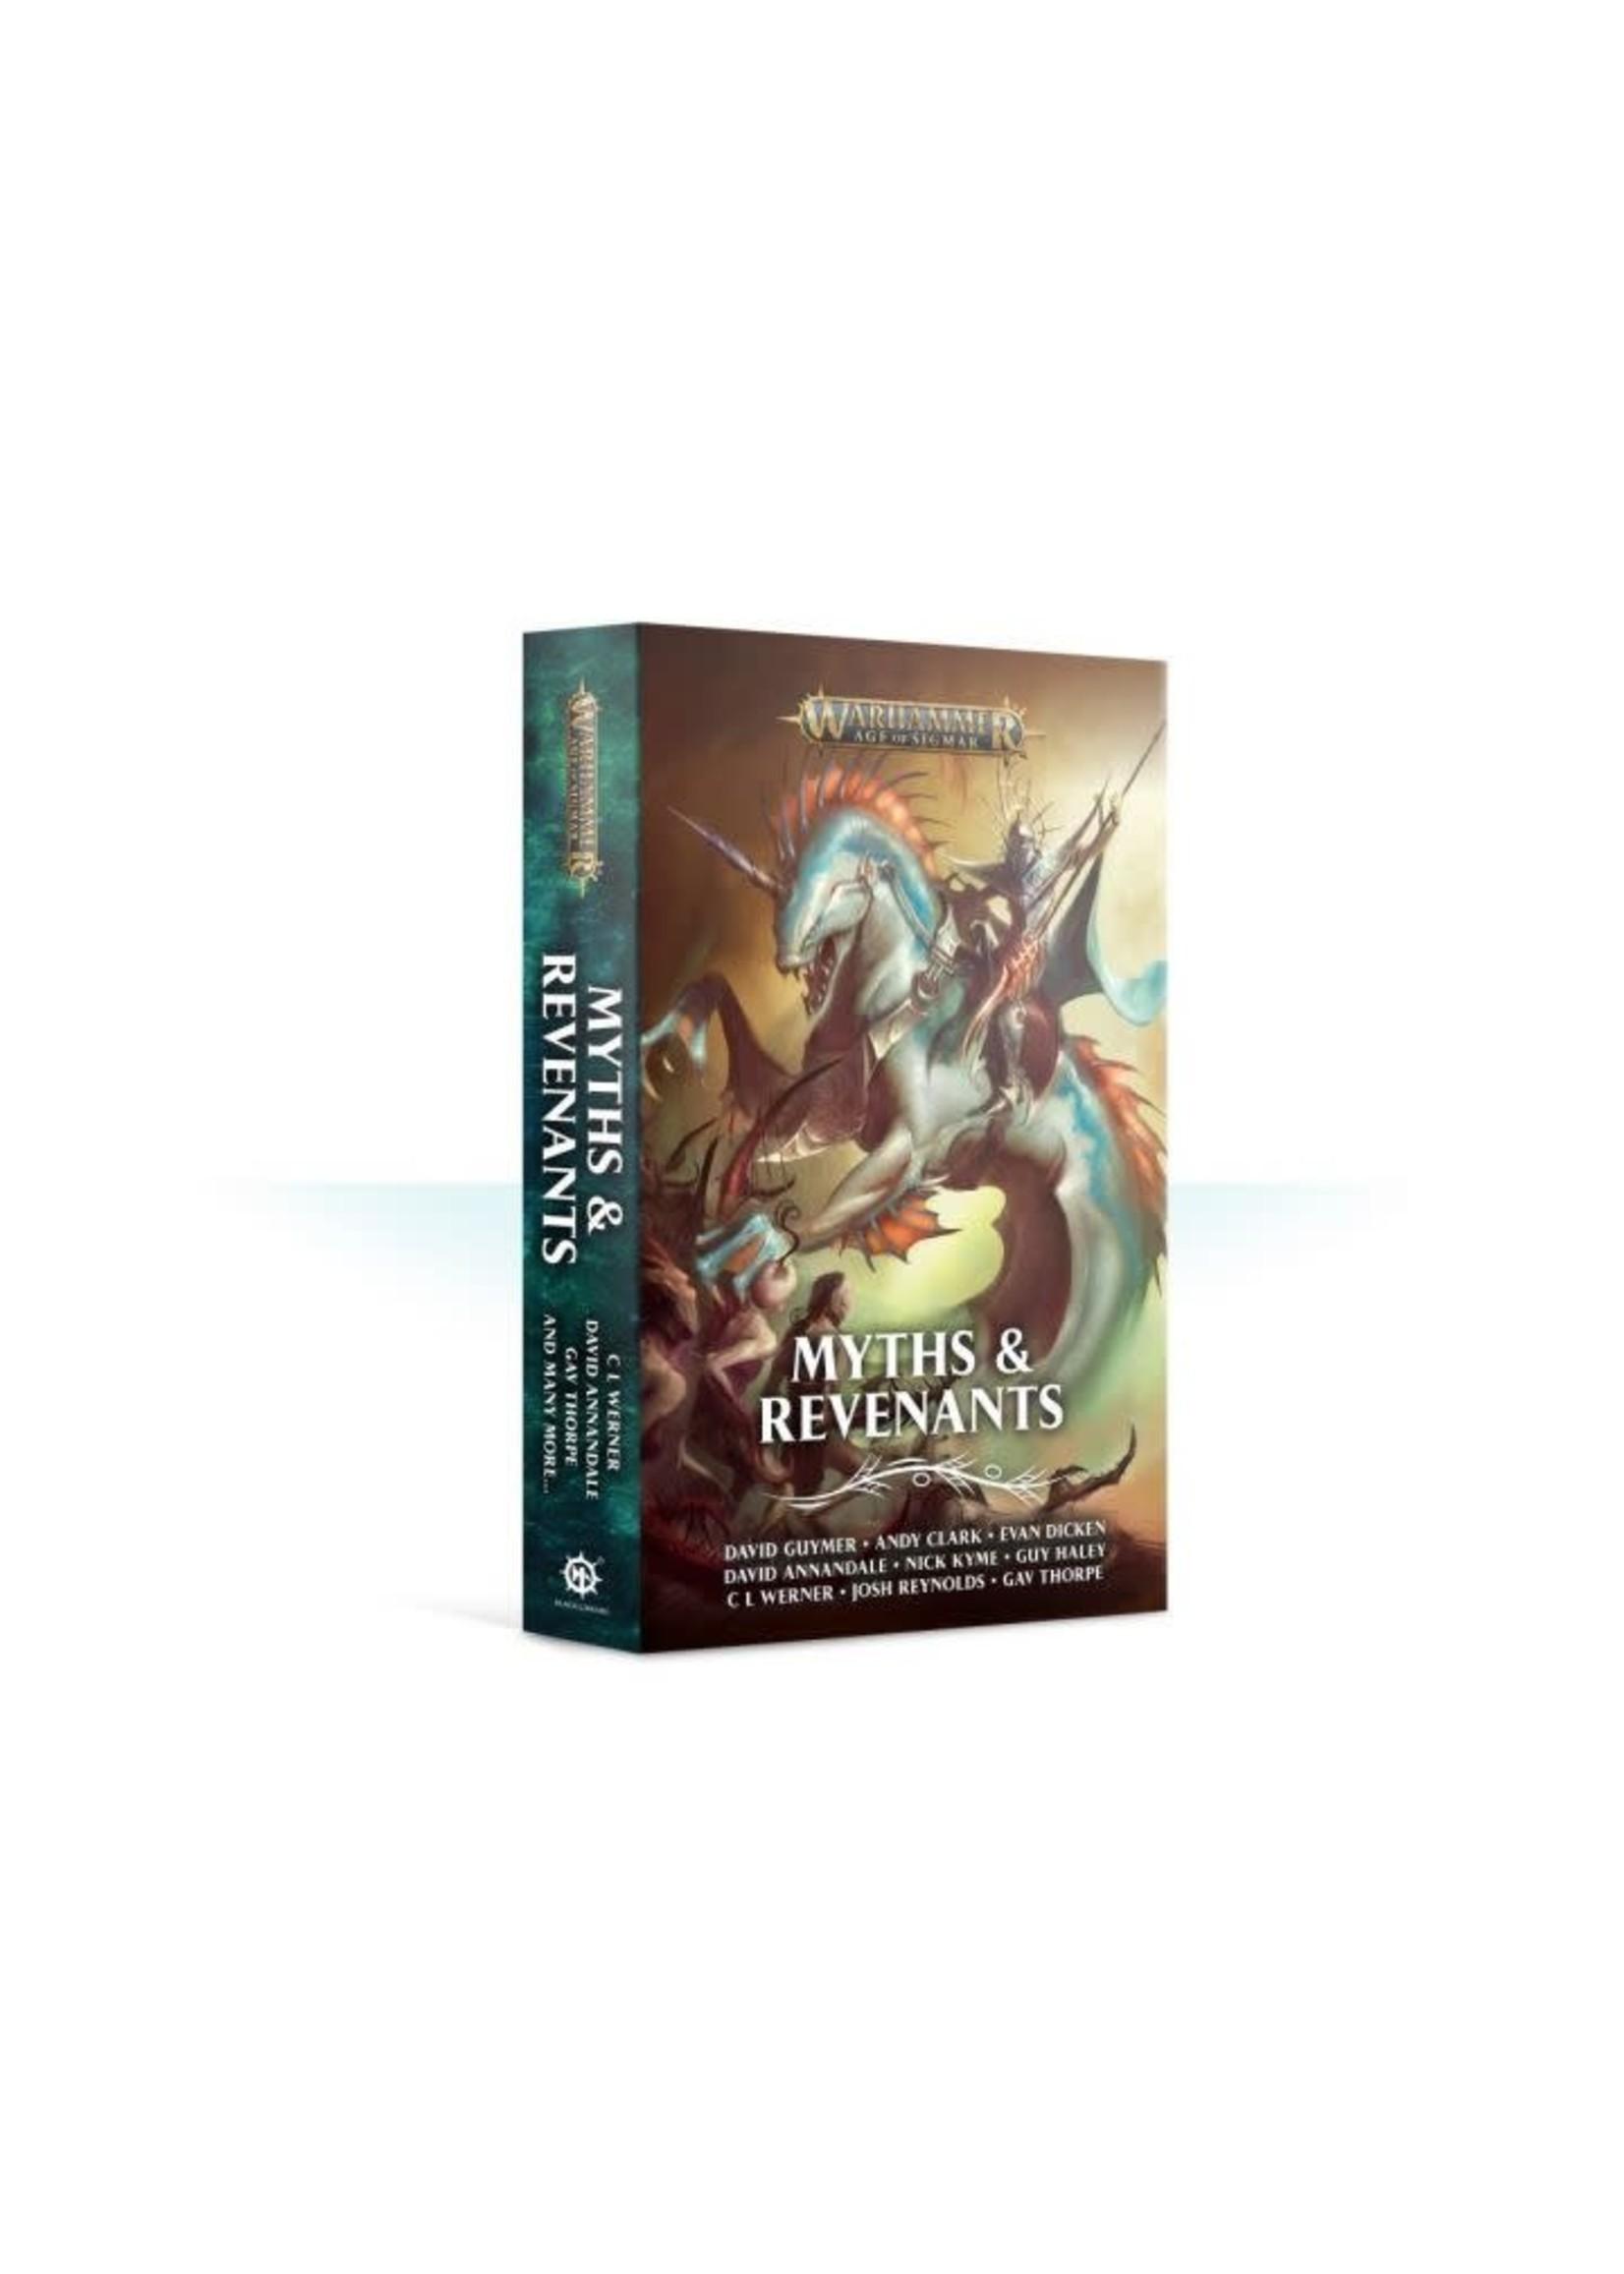 Myths And Revenants (Pb) Bl2760